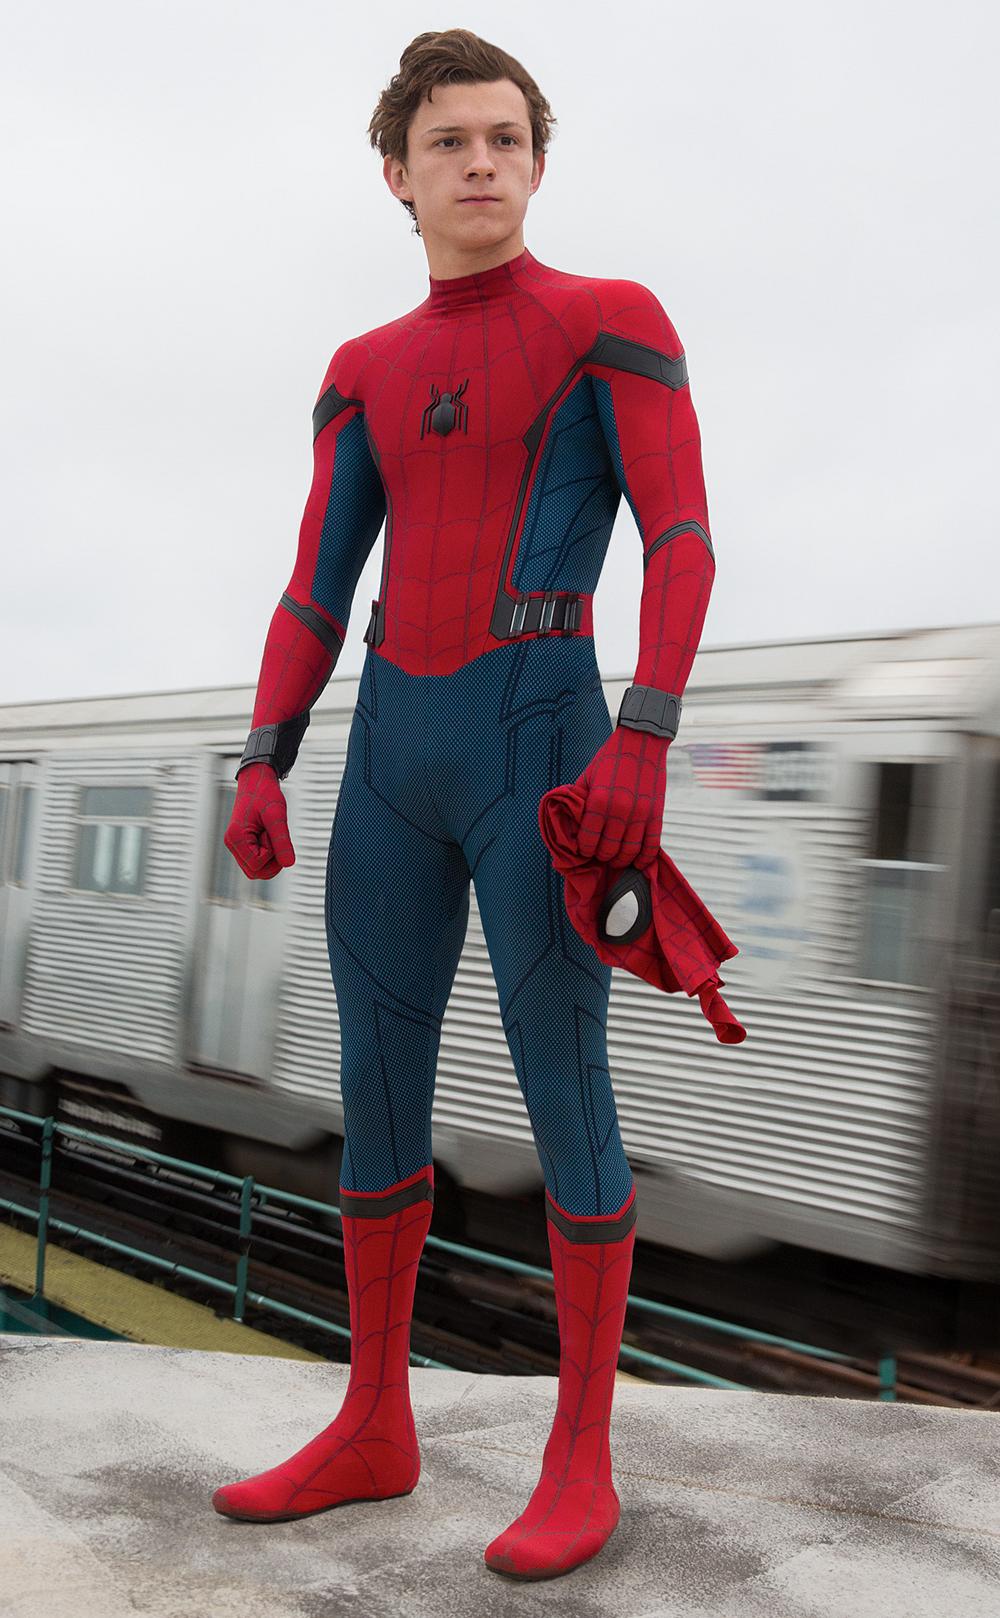 MBTI enneagram type of Peter Parker/Spider-Man